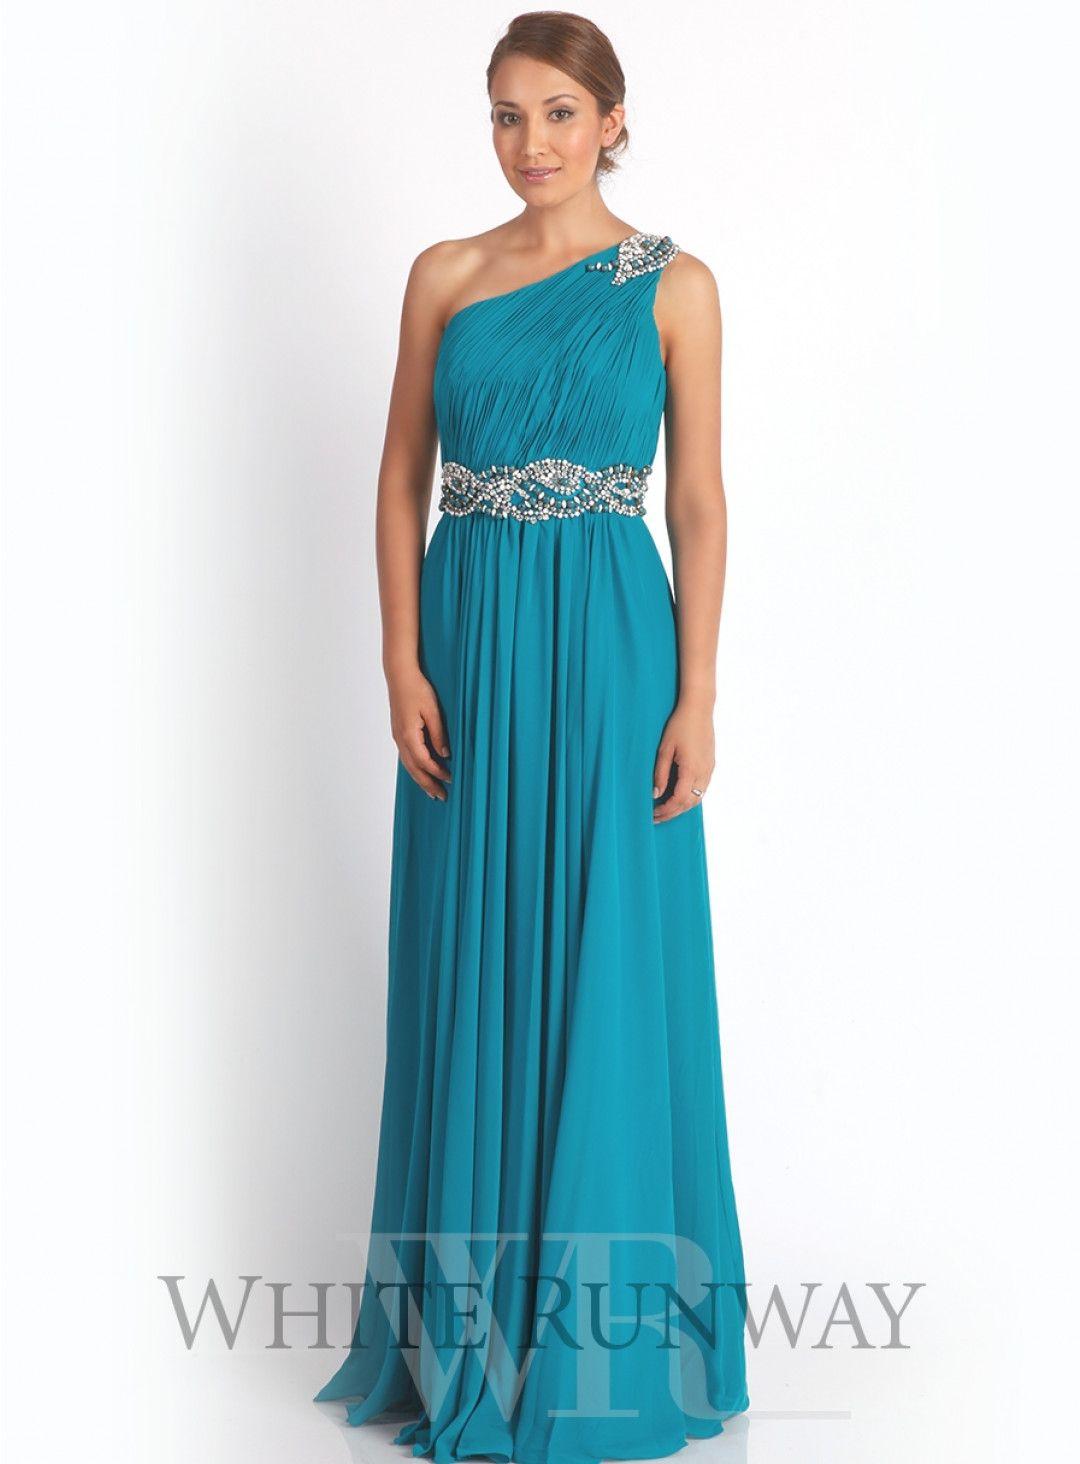 Leah Beaded Dress | Bridesmaid Dresses | Pinterest | Beads and Weddings